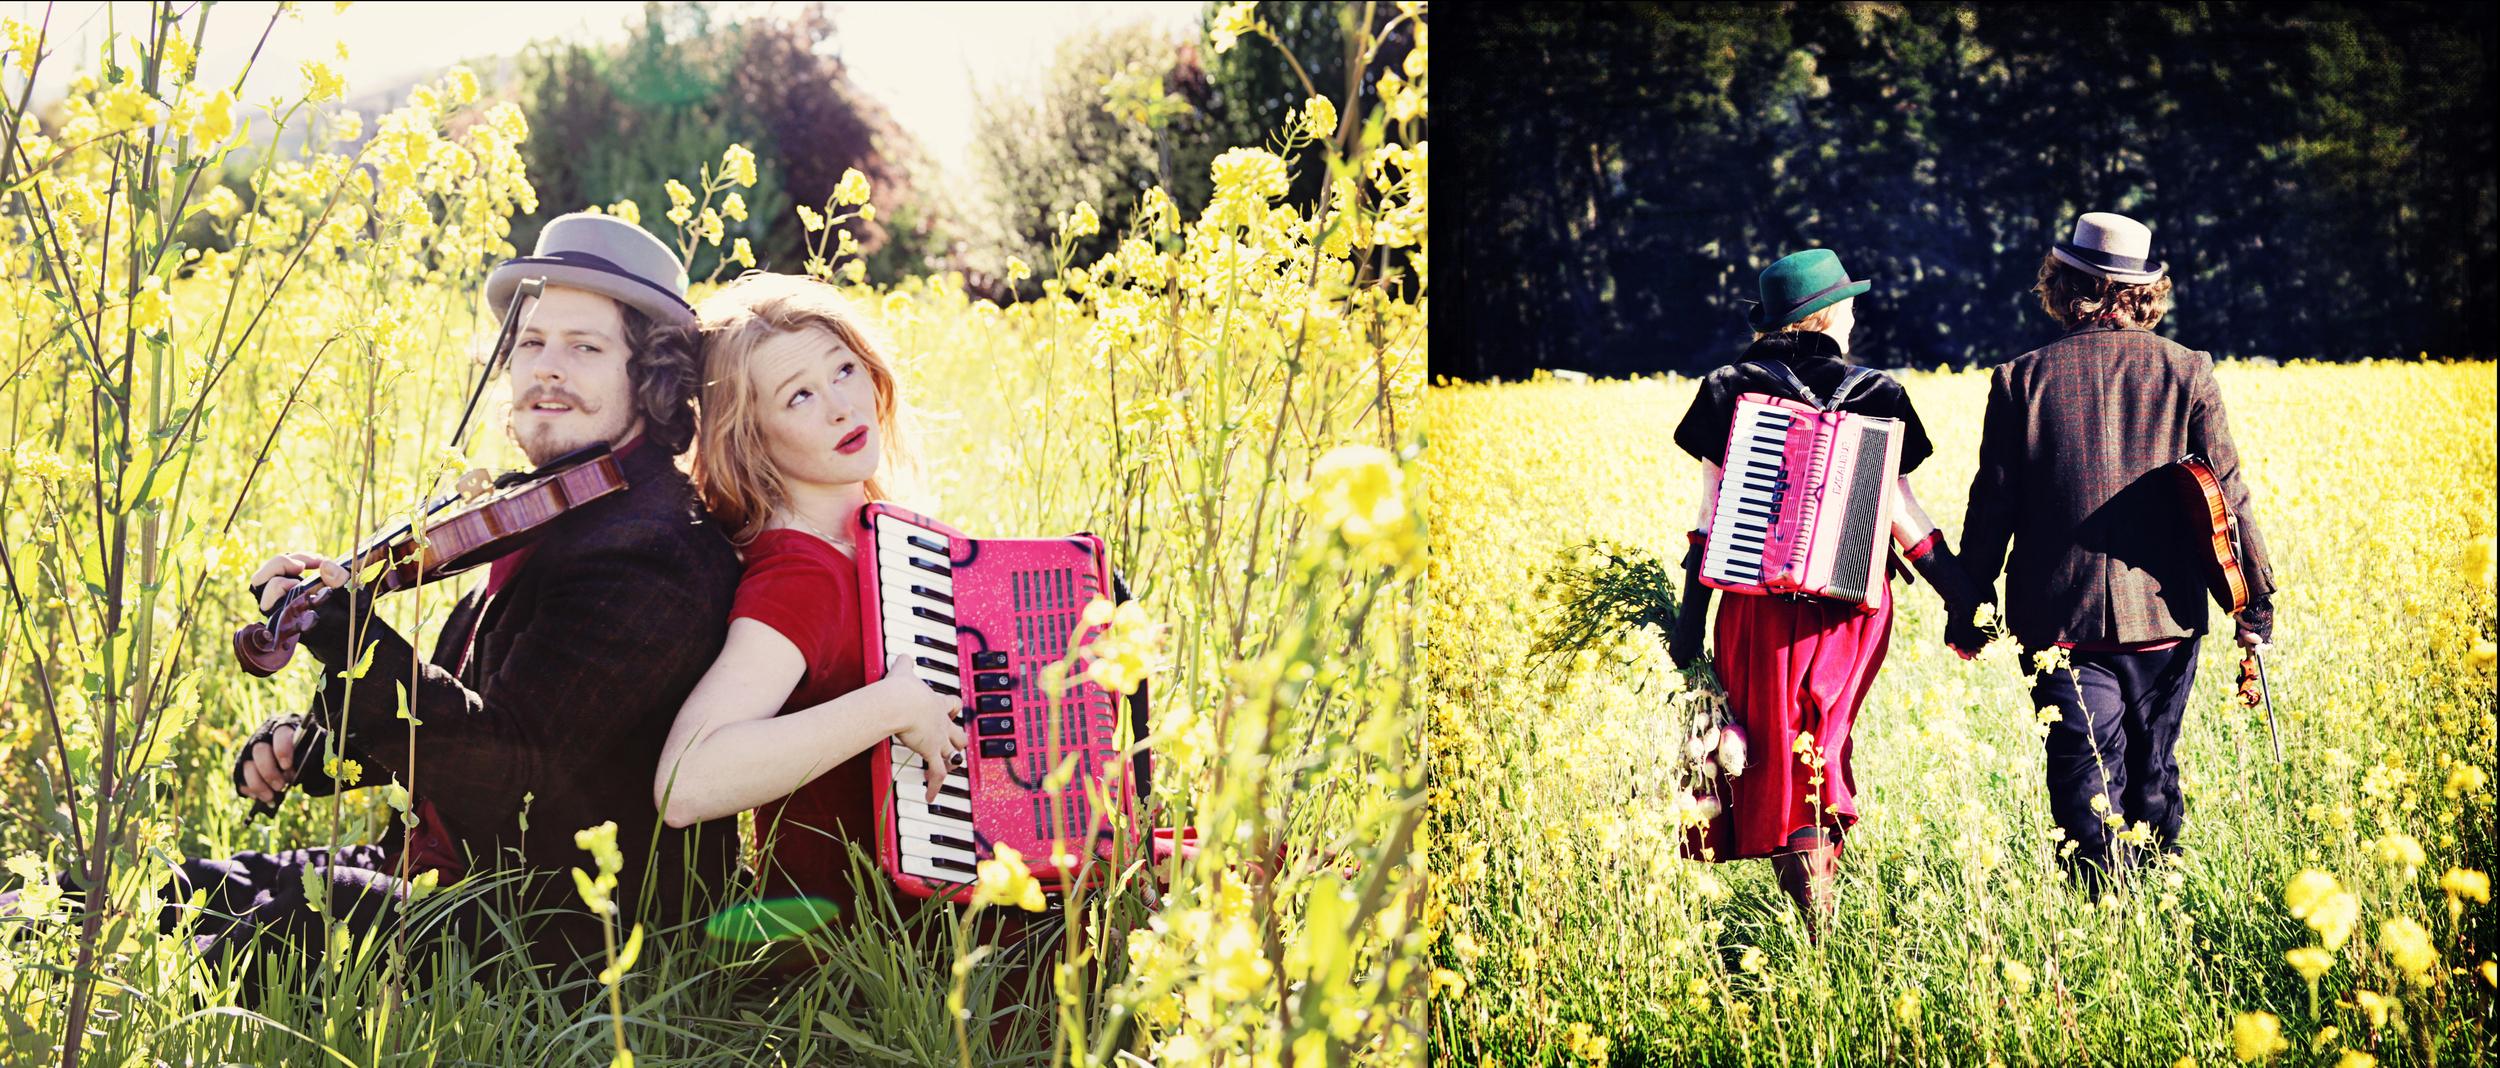 Musician promo photography